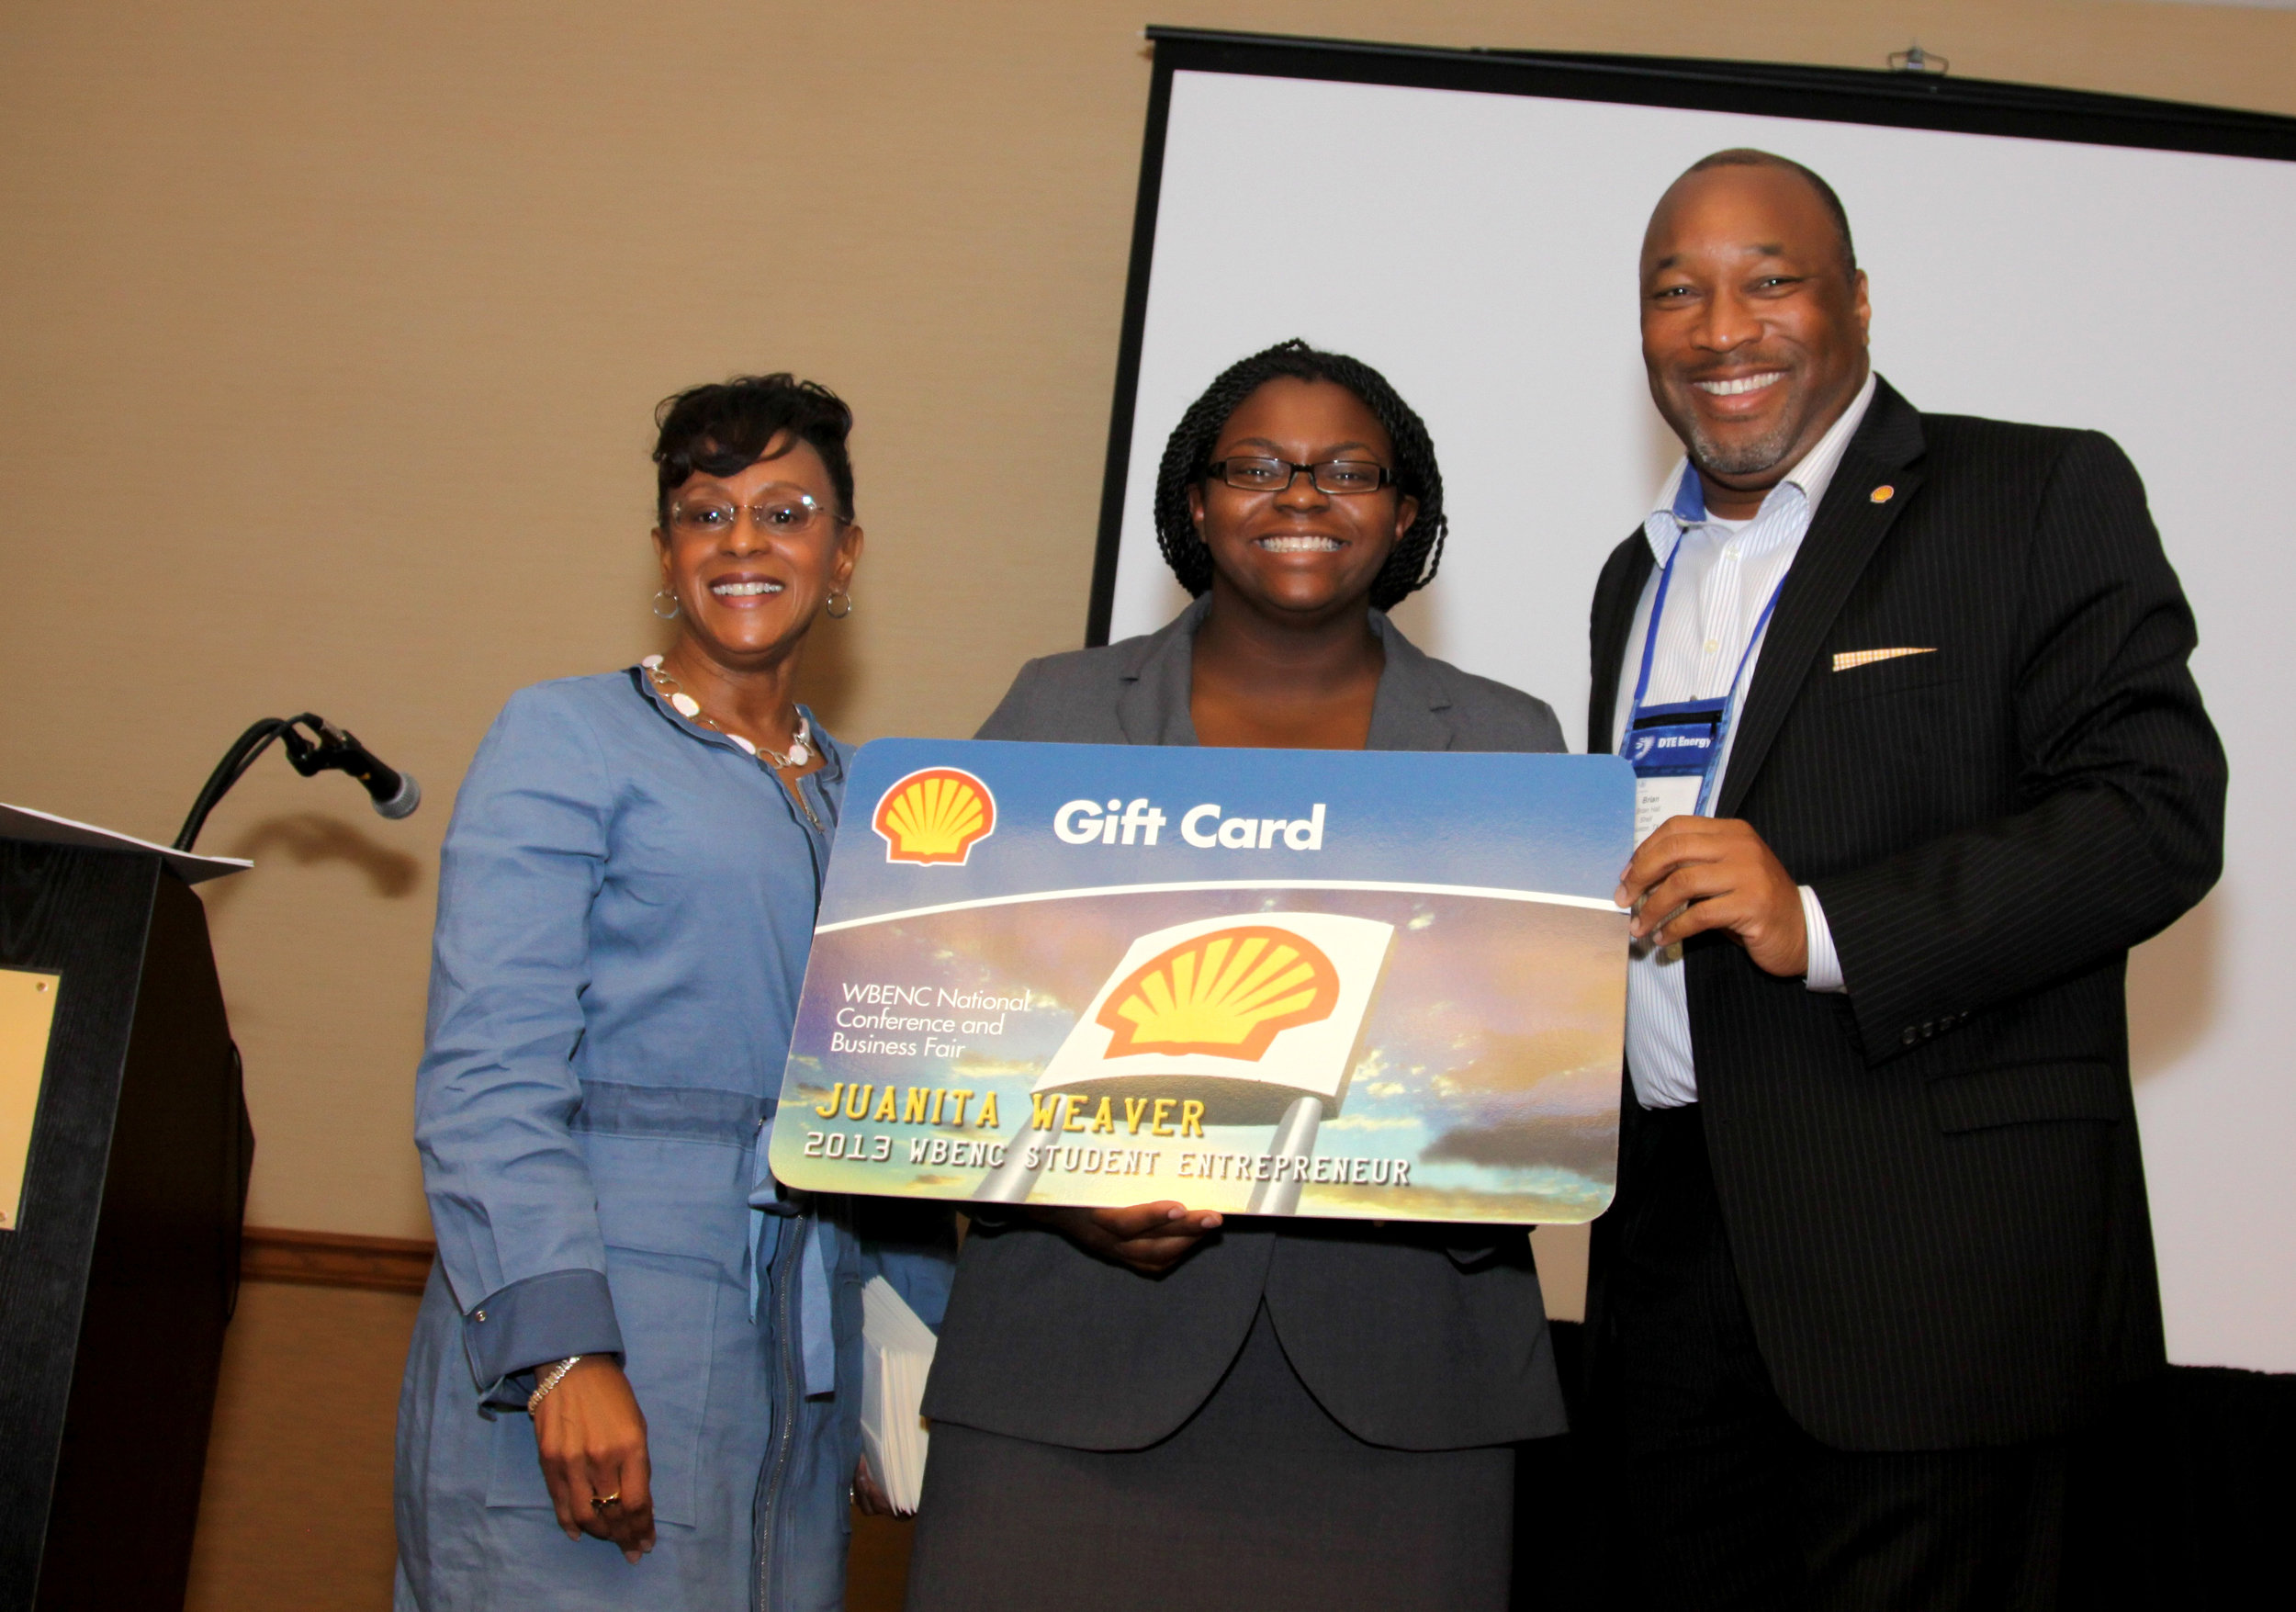 Juanita Weaver (center) with representatives from Shell.